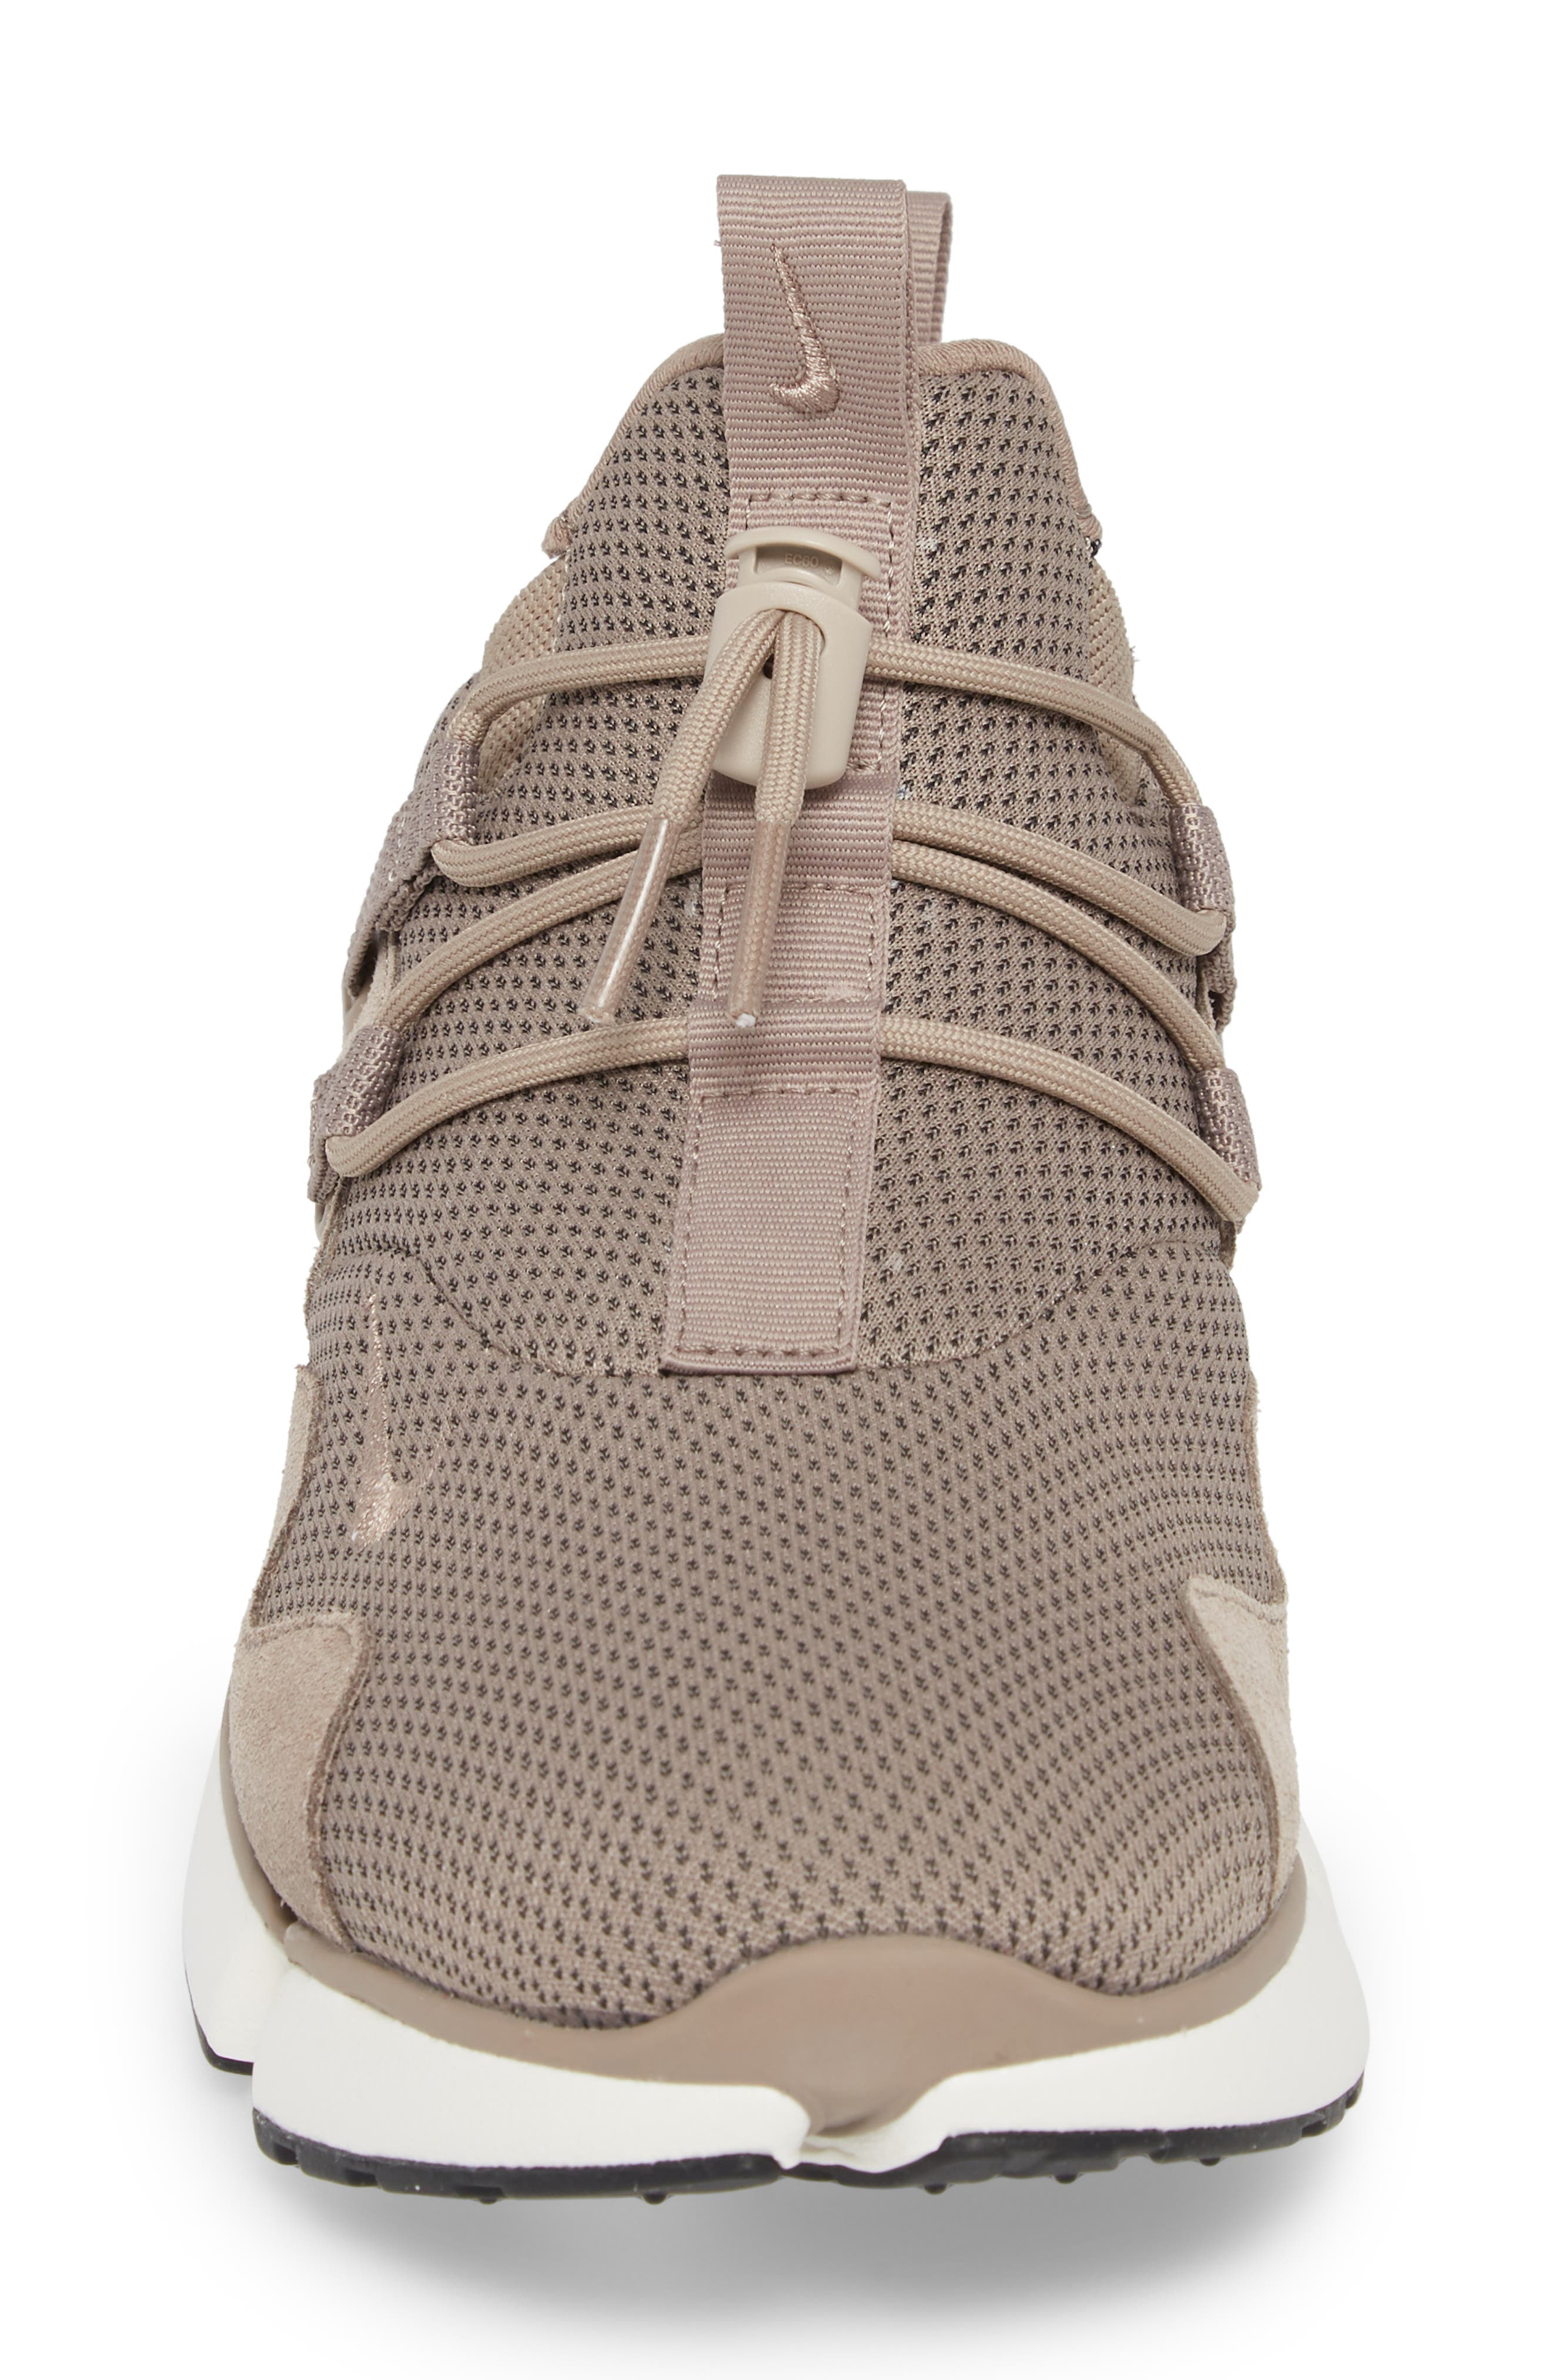 PocketKnife DM SE Sneaker,                             Alternate thumbnail 4, color,                             Sepia Stone/ Sail/ Black